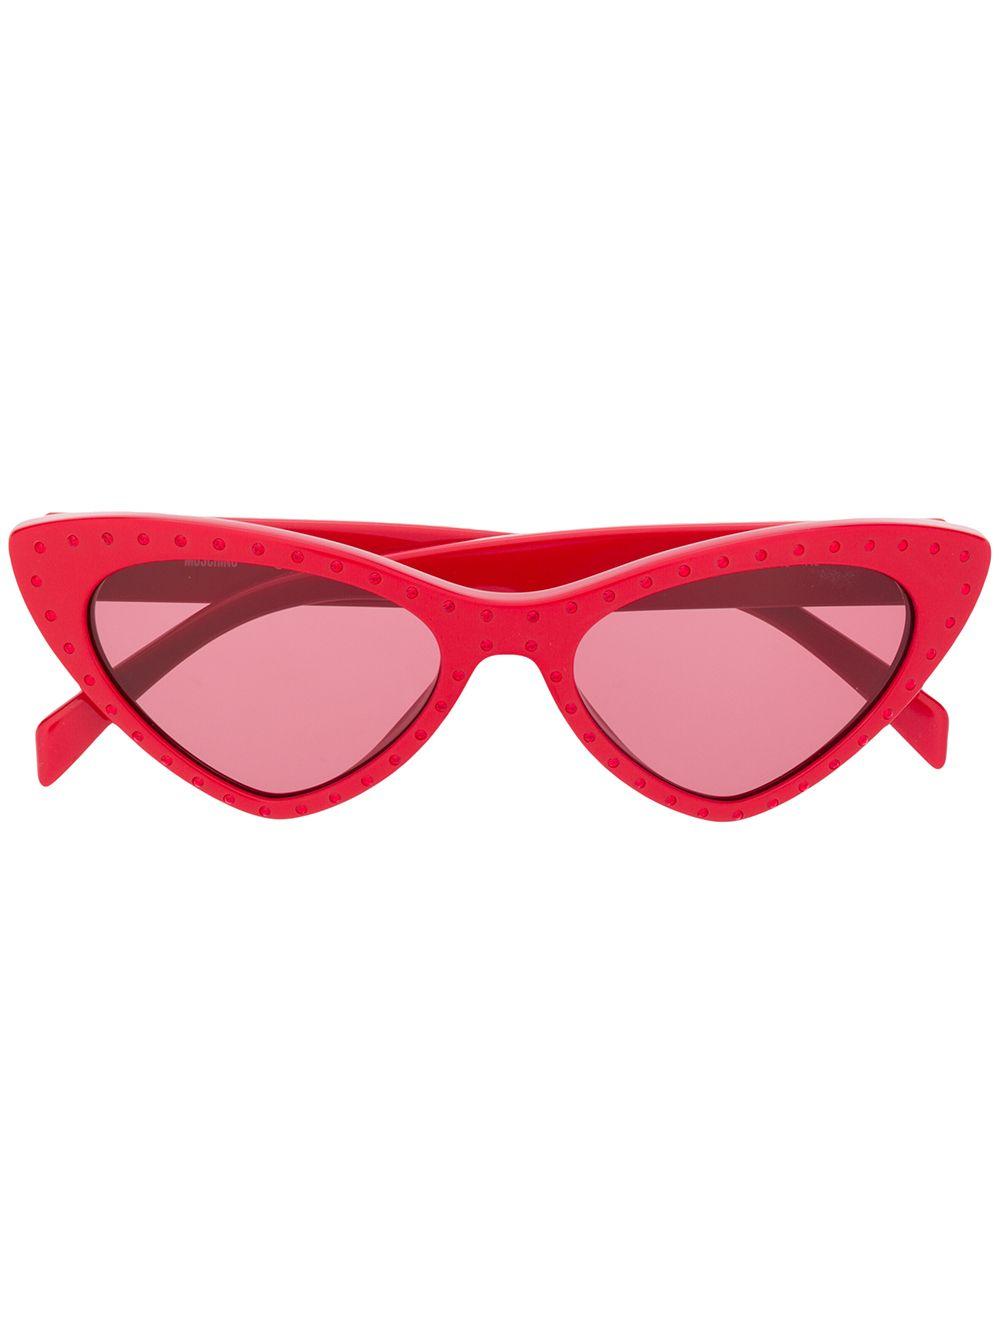 MOSCHINO | солнцезащитные очки в оправе 'кошачий глаз' | Clouty